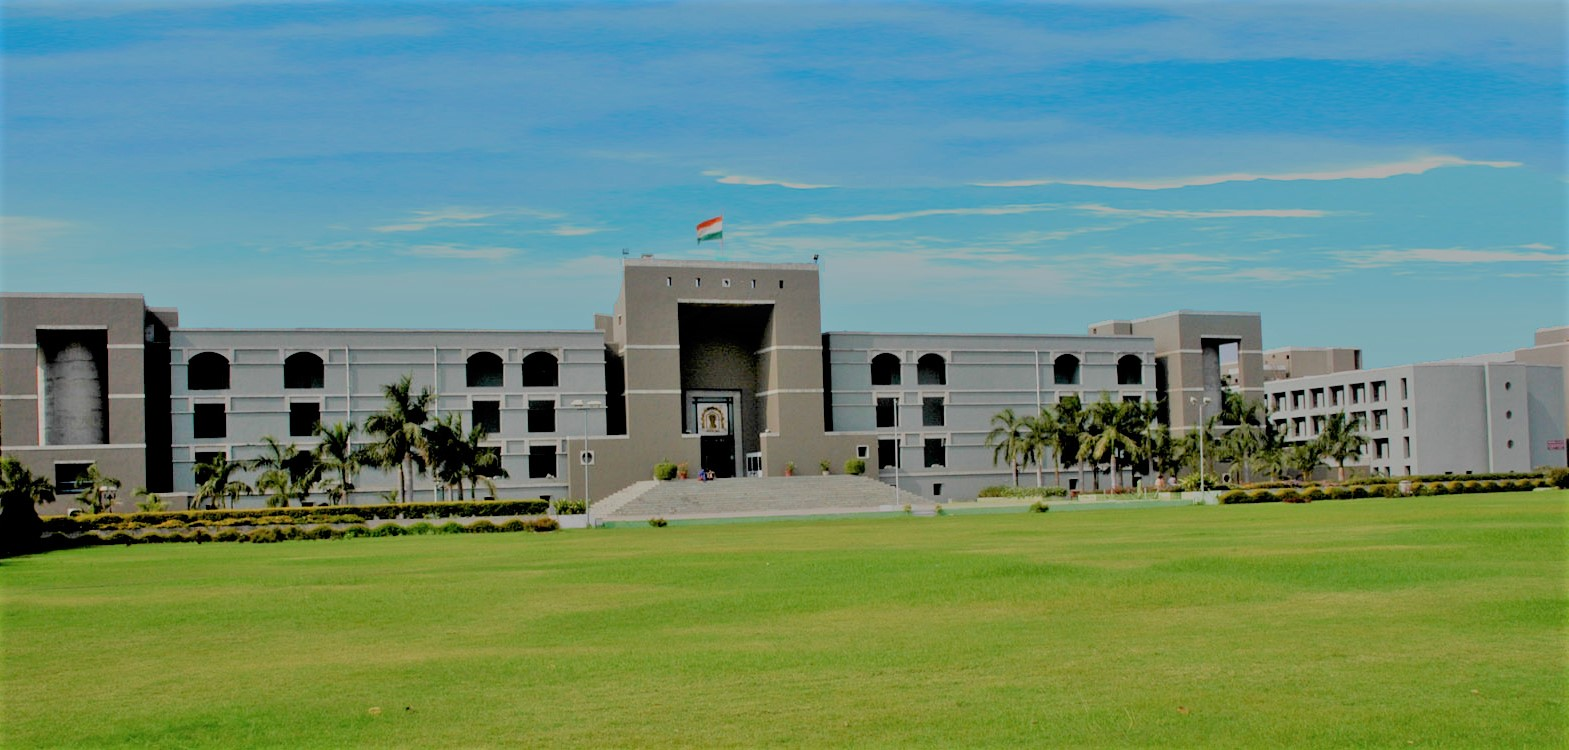 Ahmedabad civil hospital conditions pathetic, painful: Guj HC